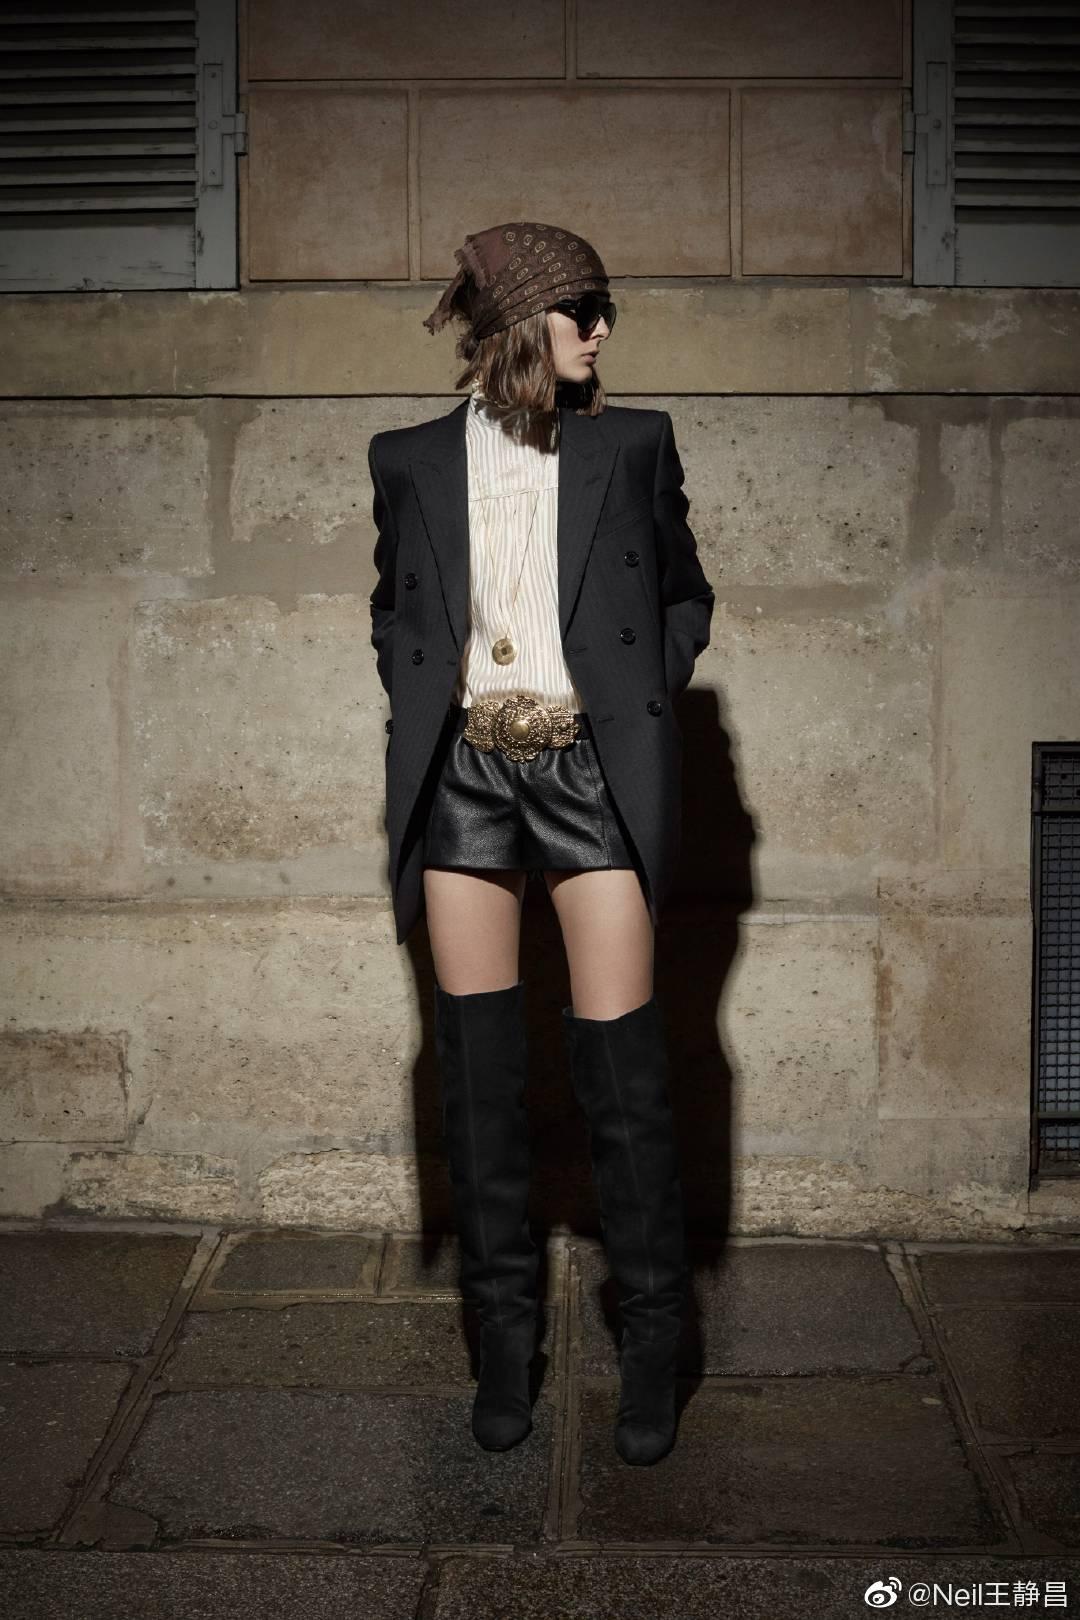 Saint Laurent 2020早秋女装系列这一季不少作品都透露着YSL经典样式